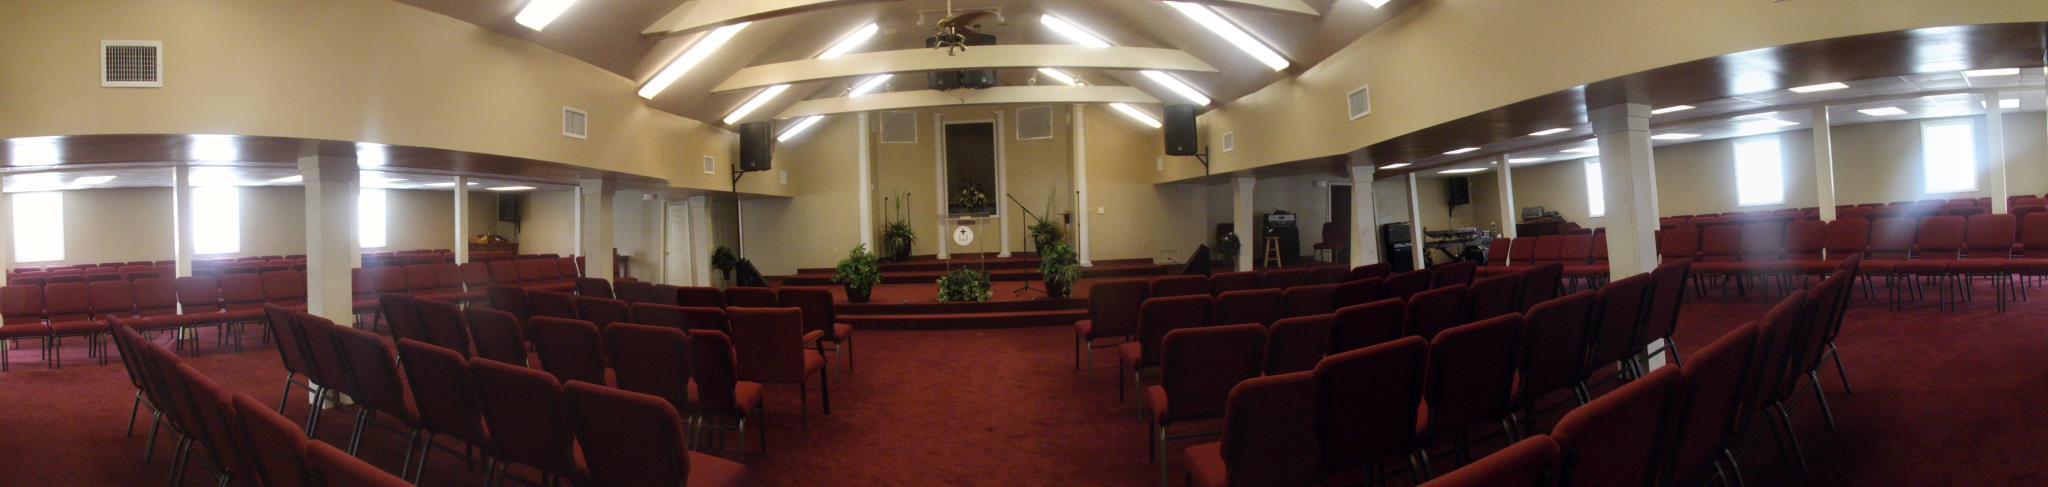 St Paul Church of God in Christ